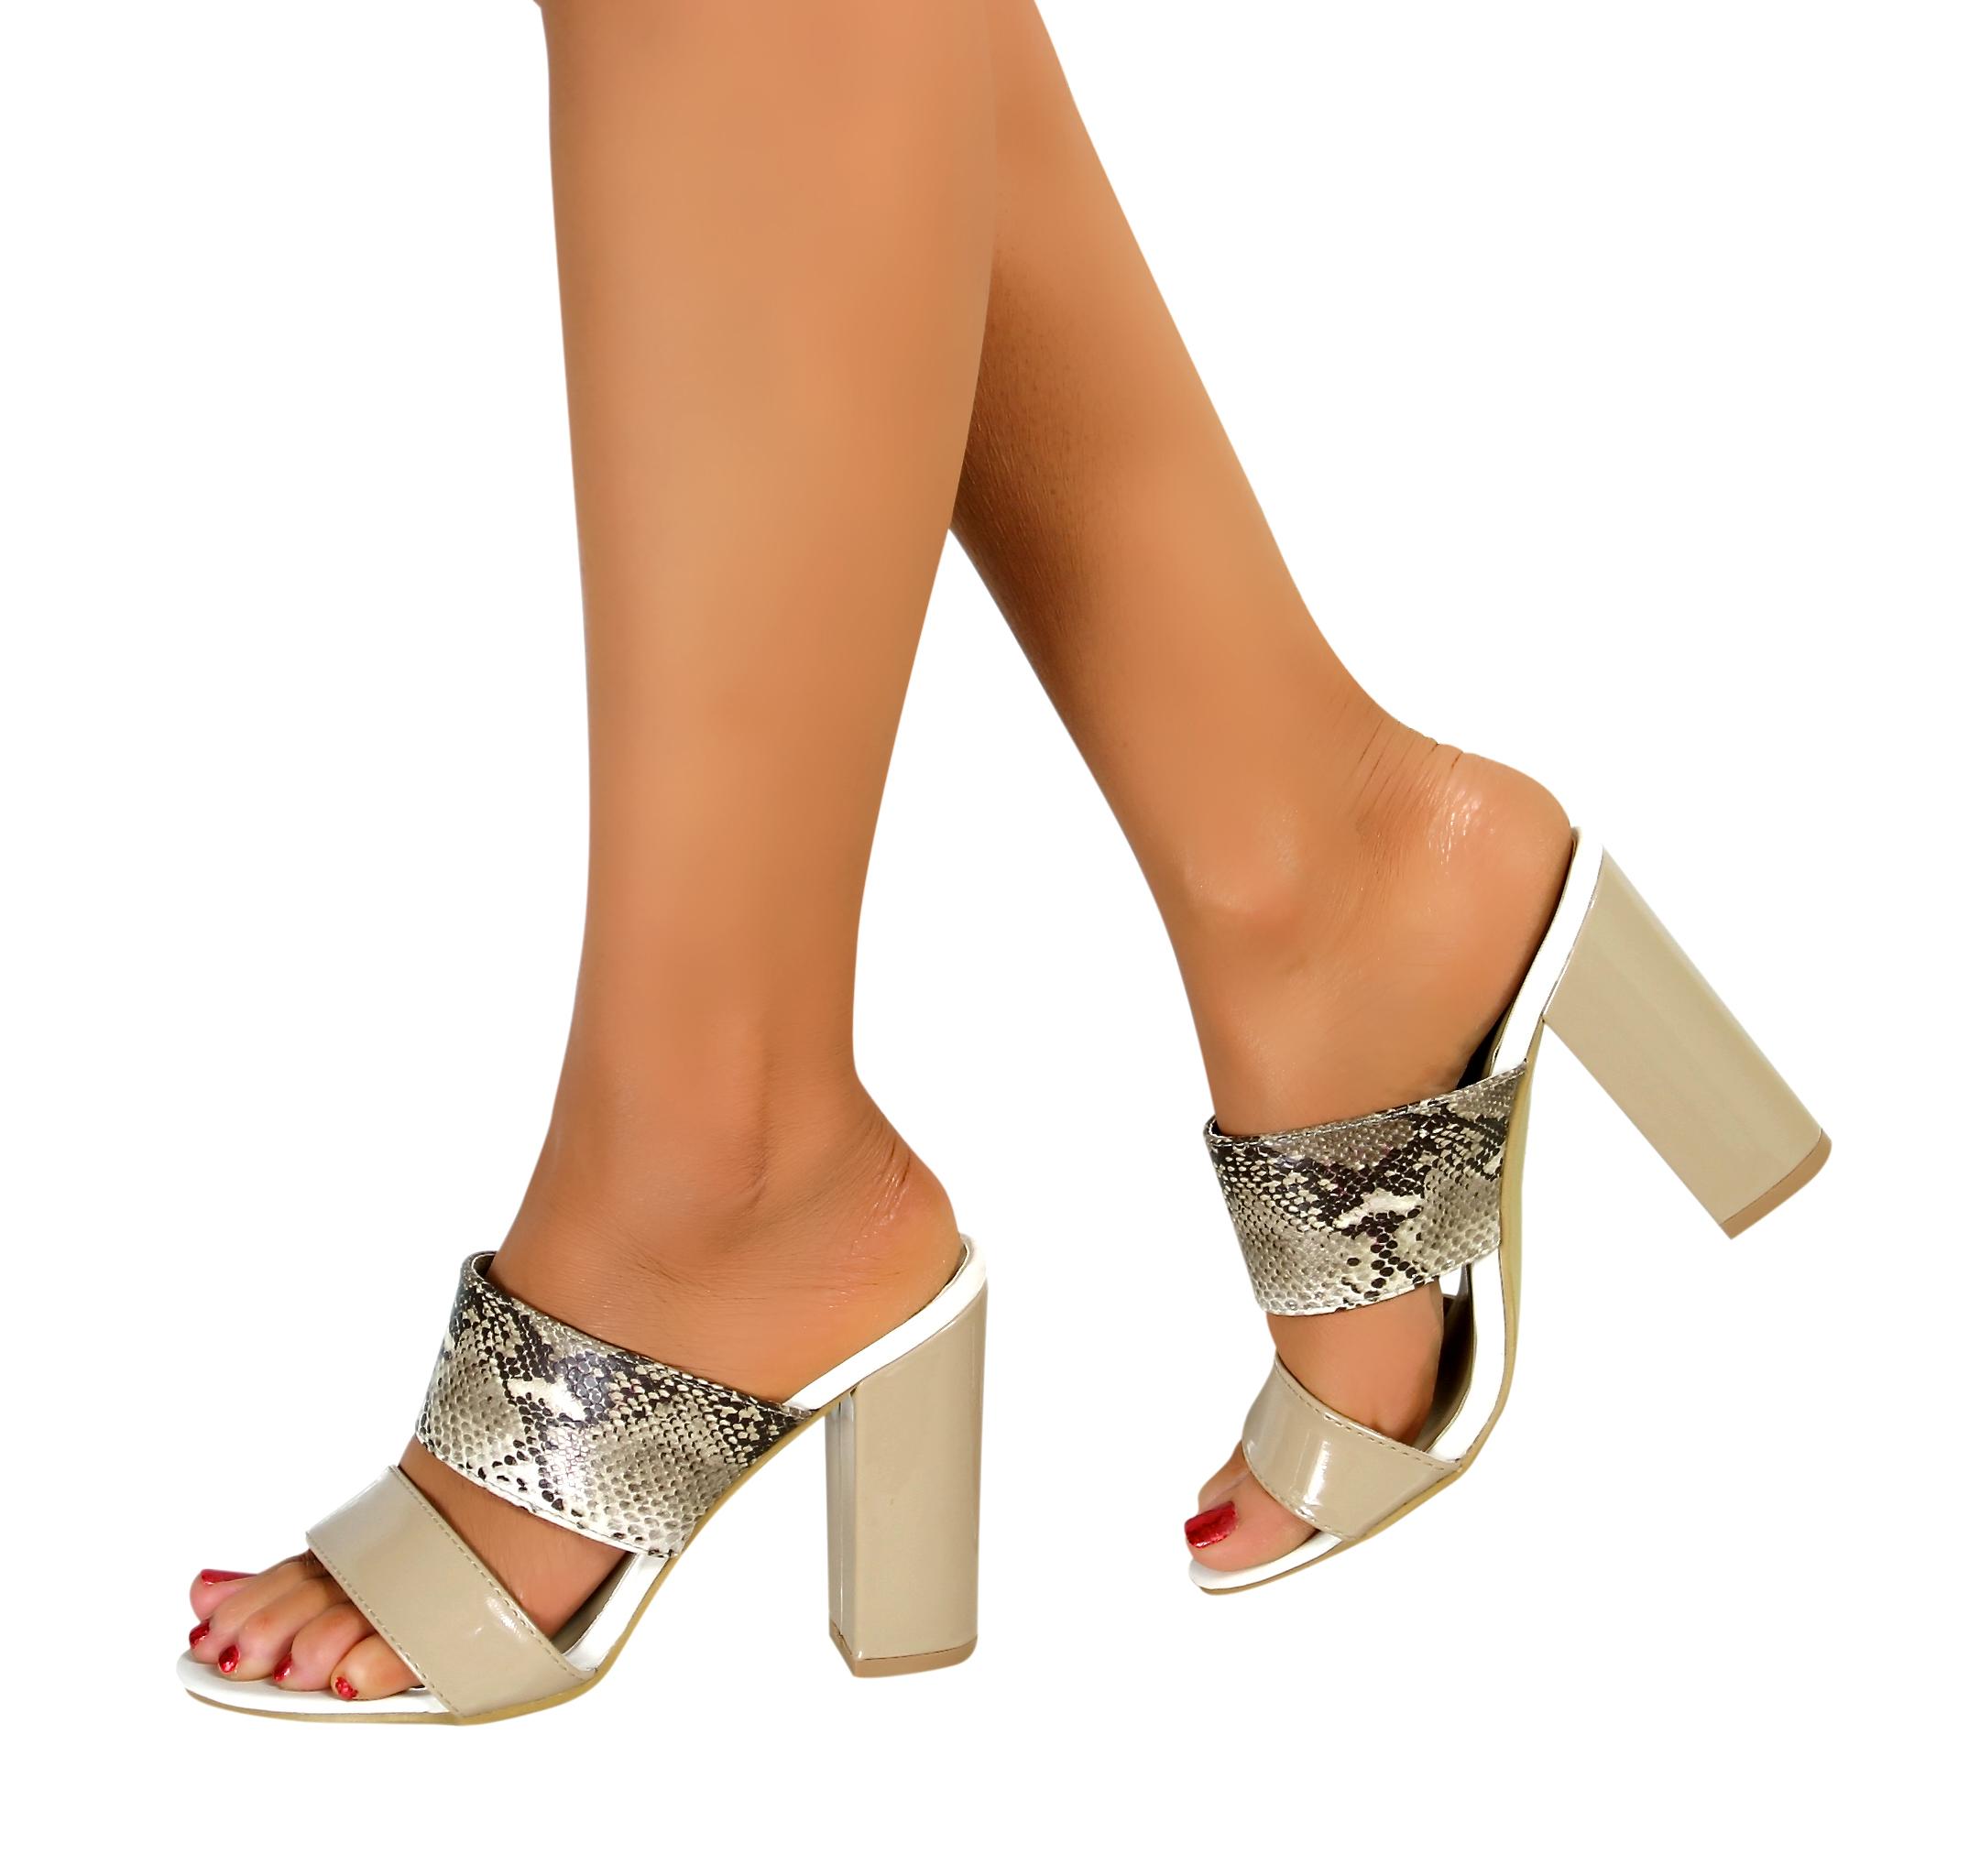 femme femmes chunky talon haut bloc enfiler bout ouvert mules soir e sandales chaussures ebay. Black Bedroom Furniture Sets. Home Design Ideas